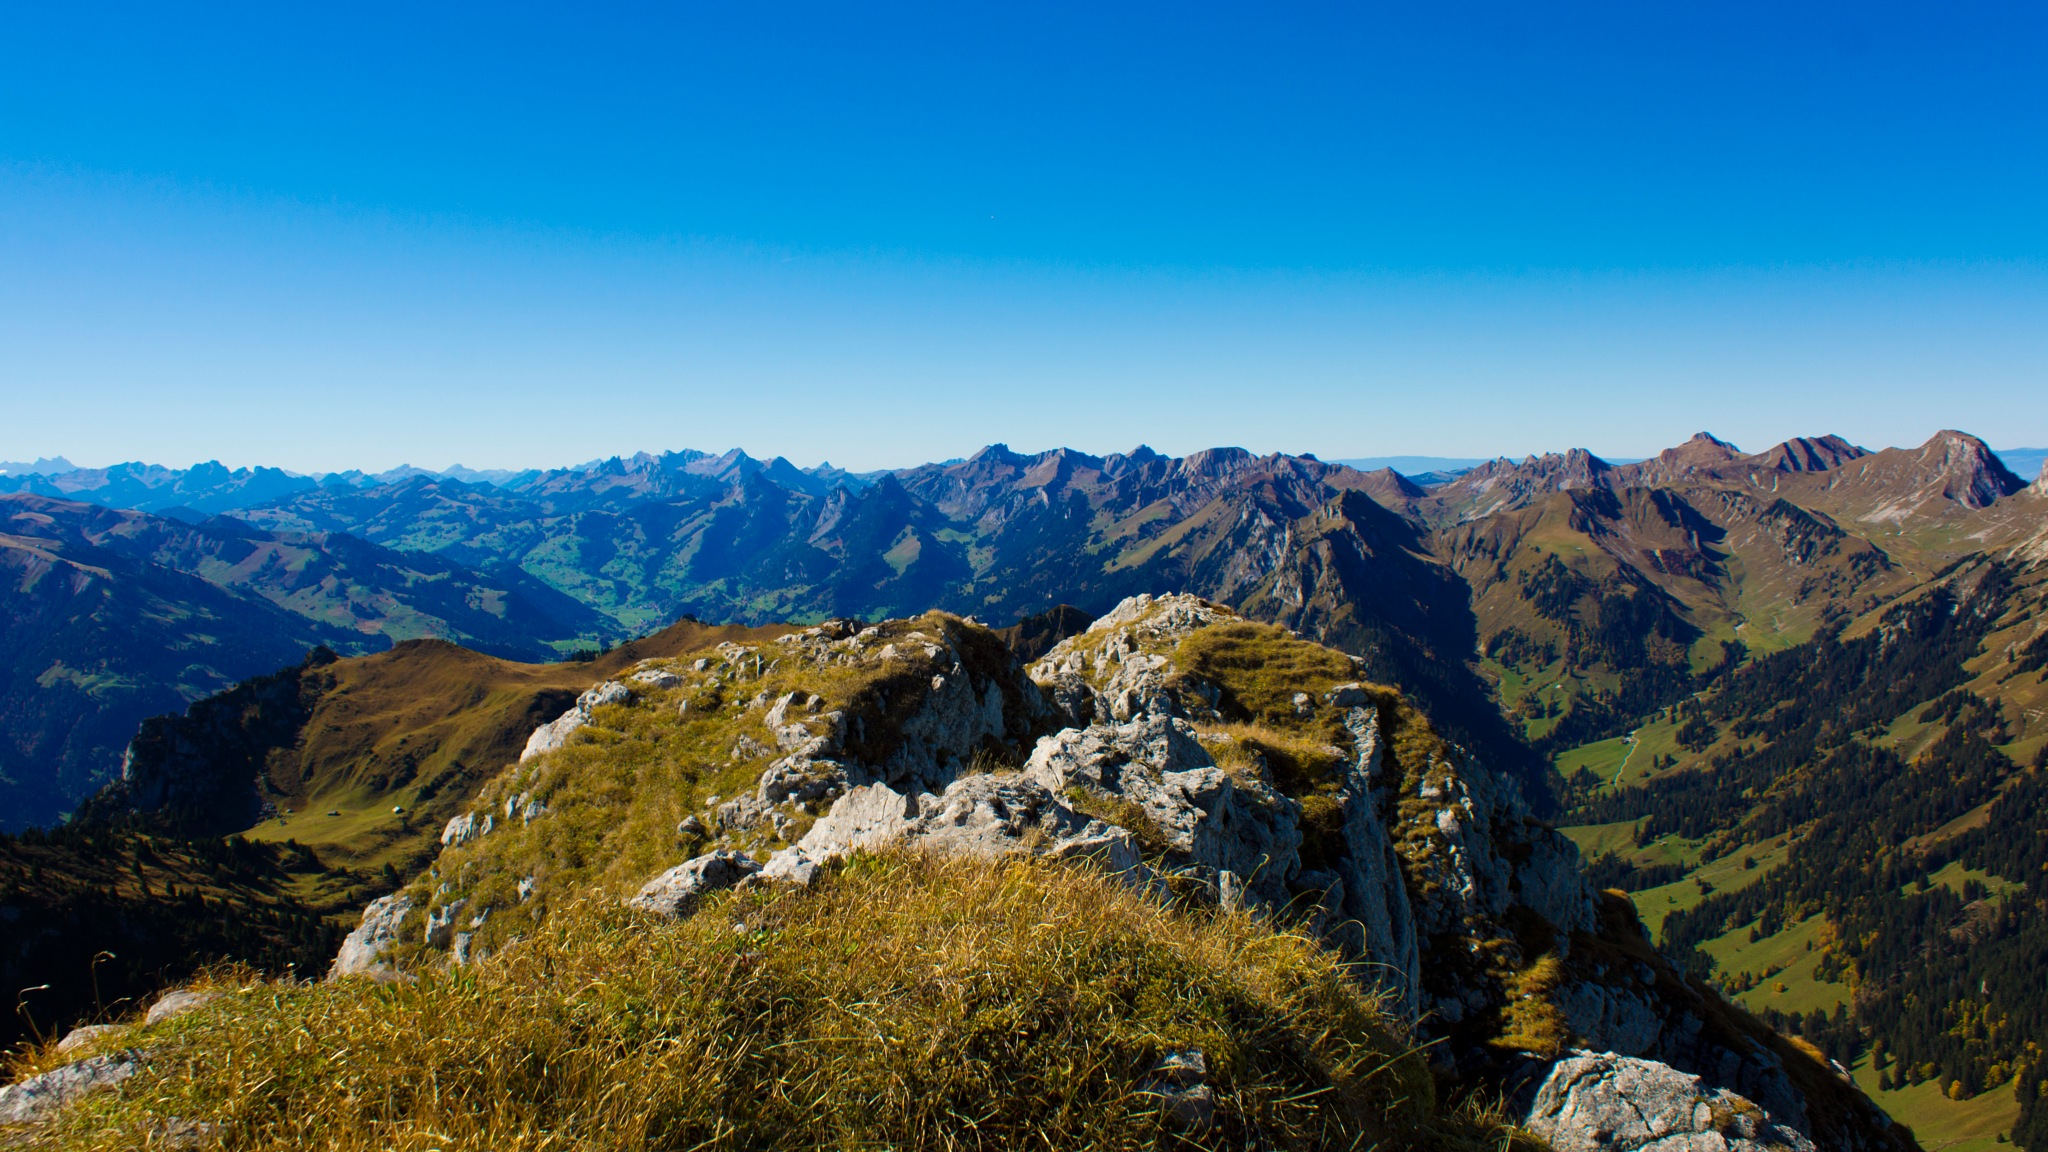 Swiss Mountains by Angelehb0617